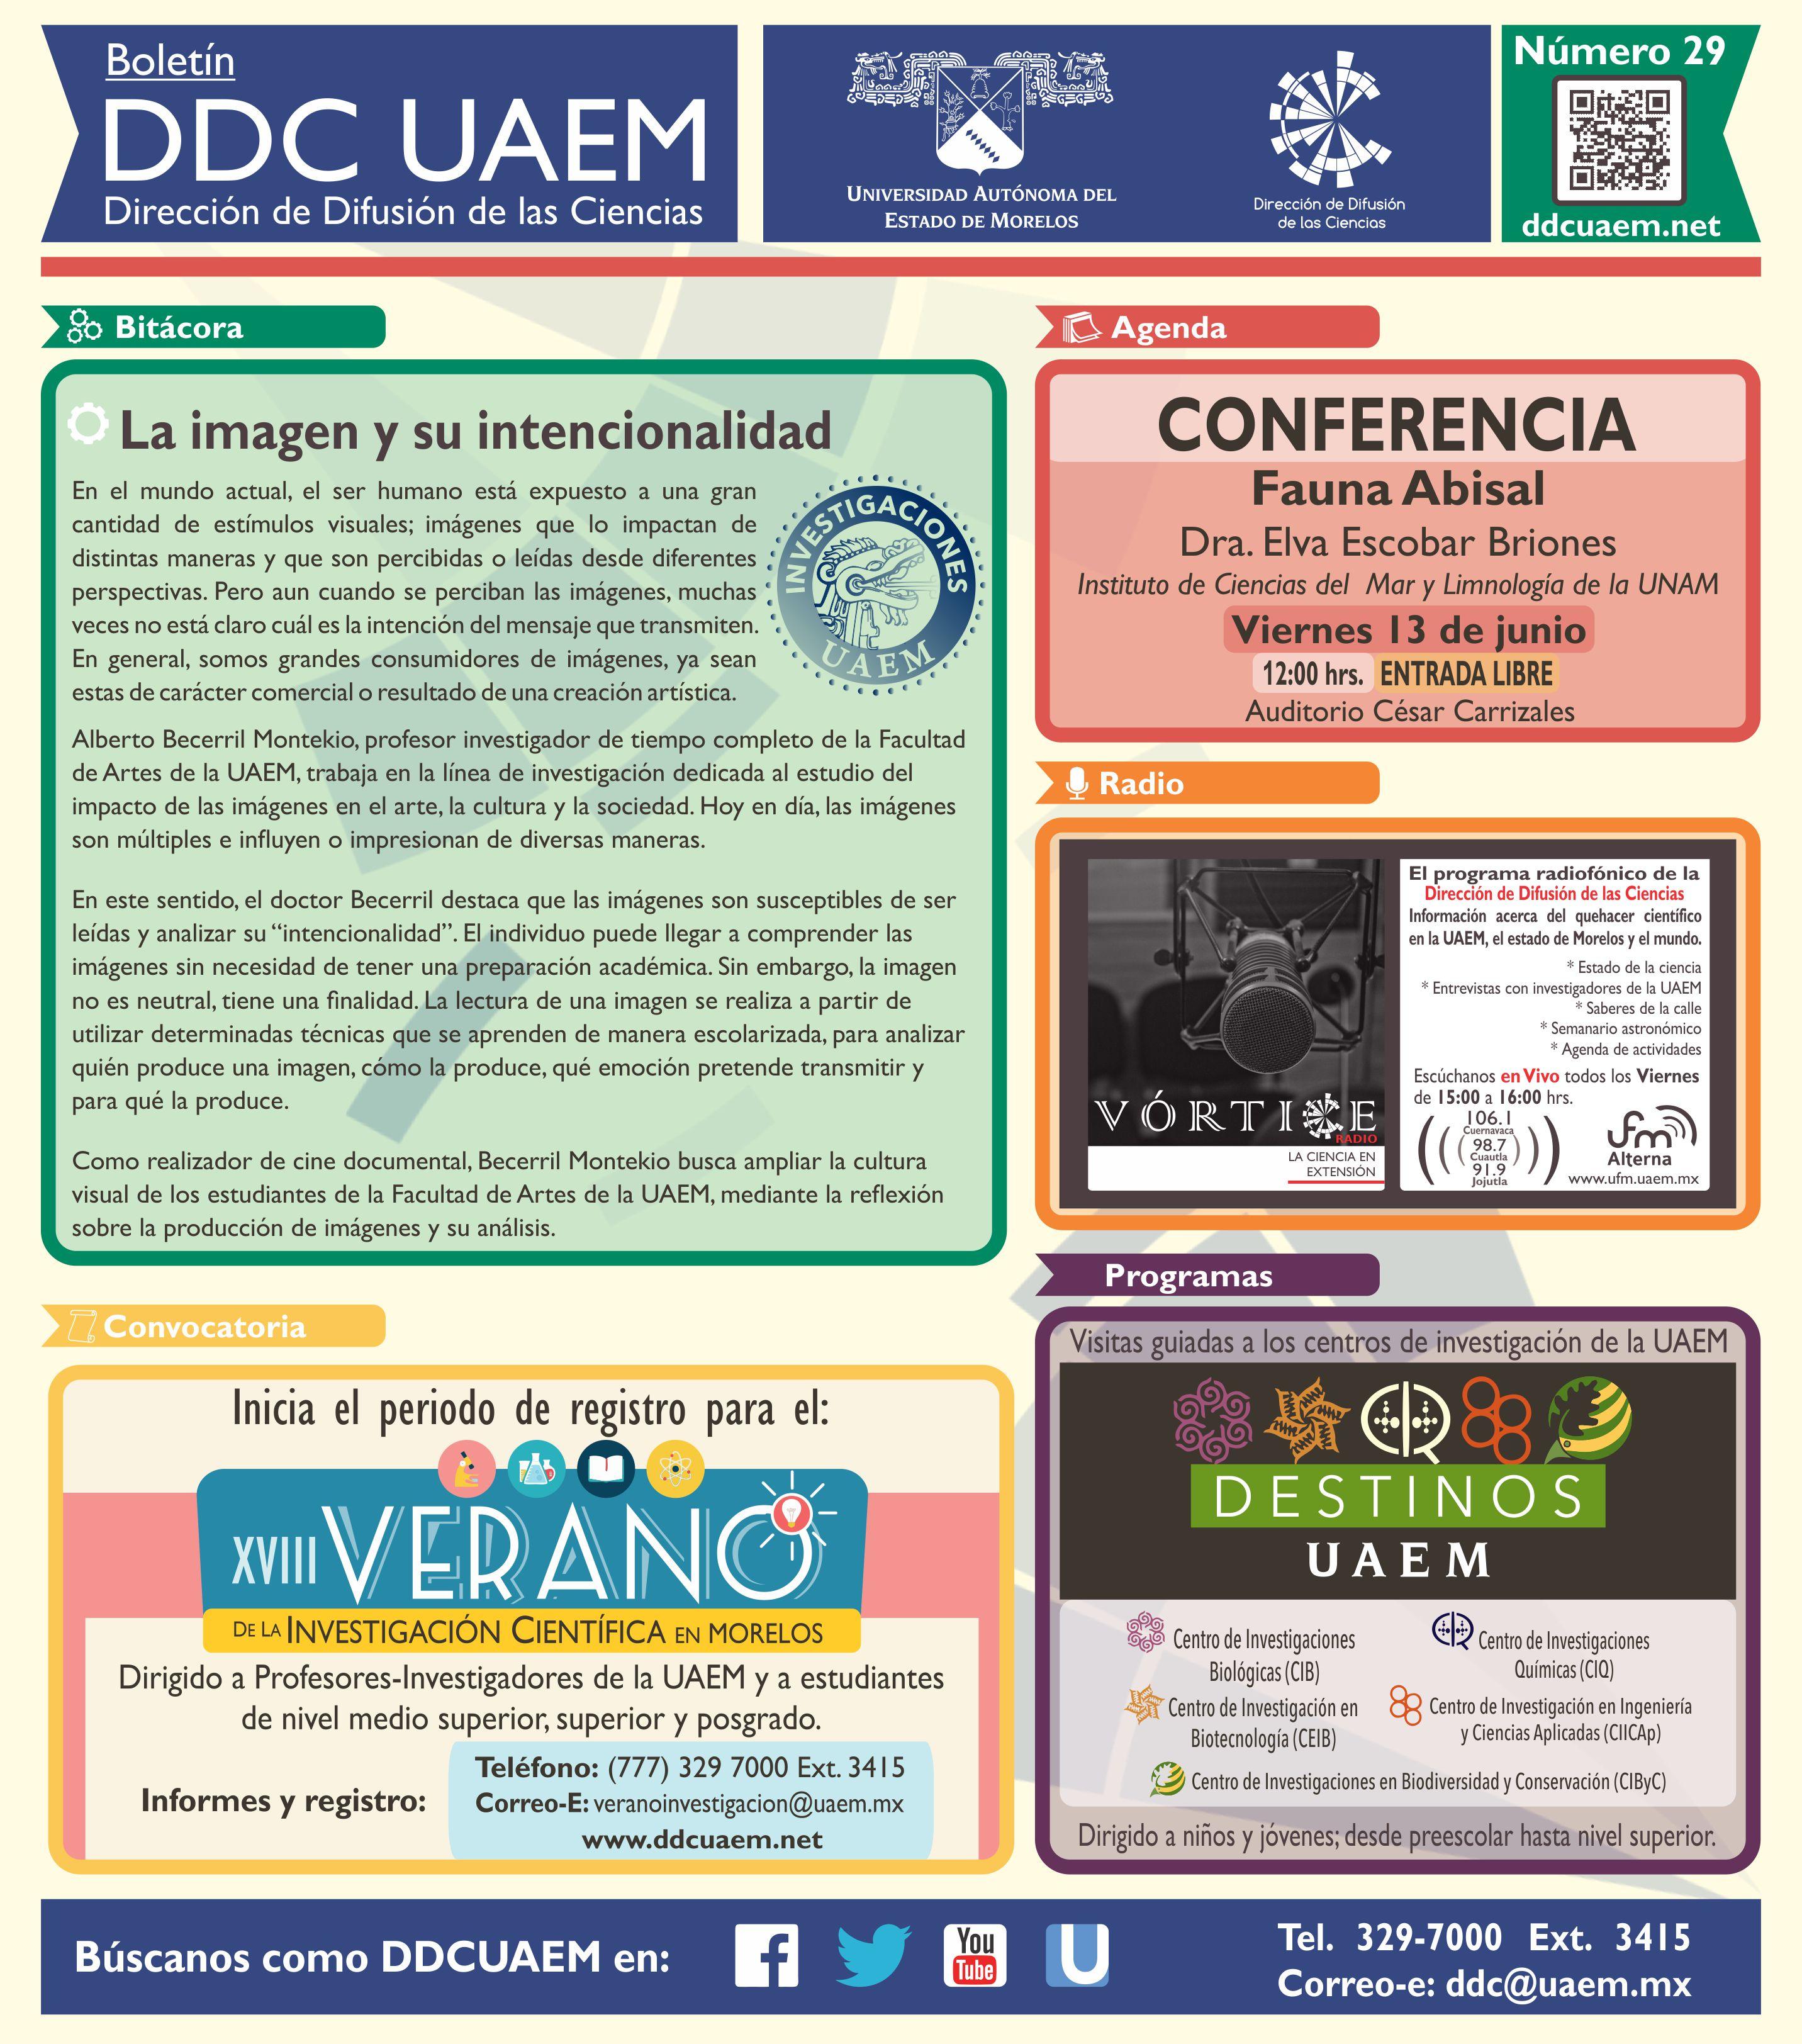 Boletín DDC 29 - RS